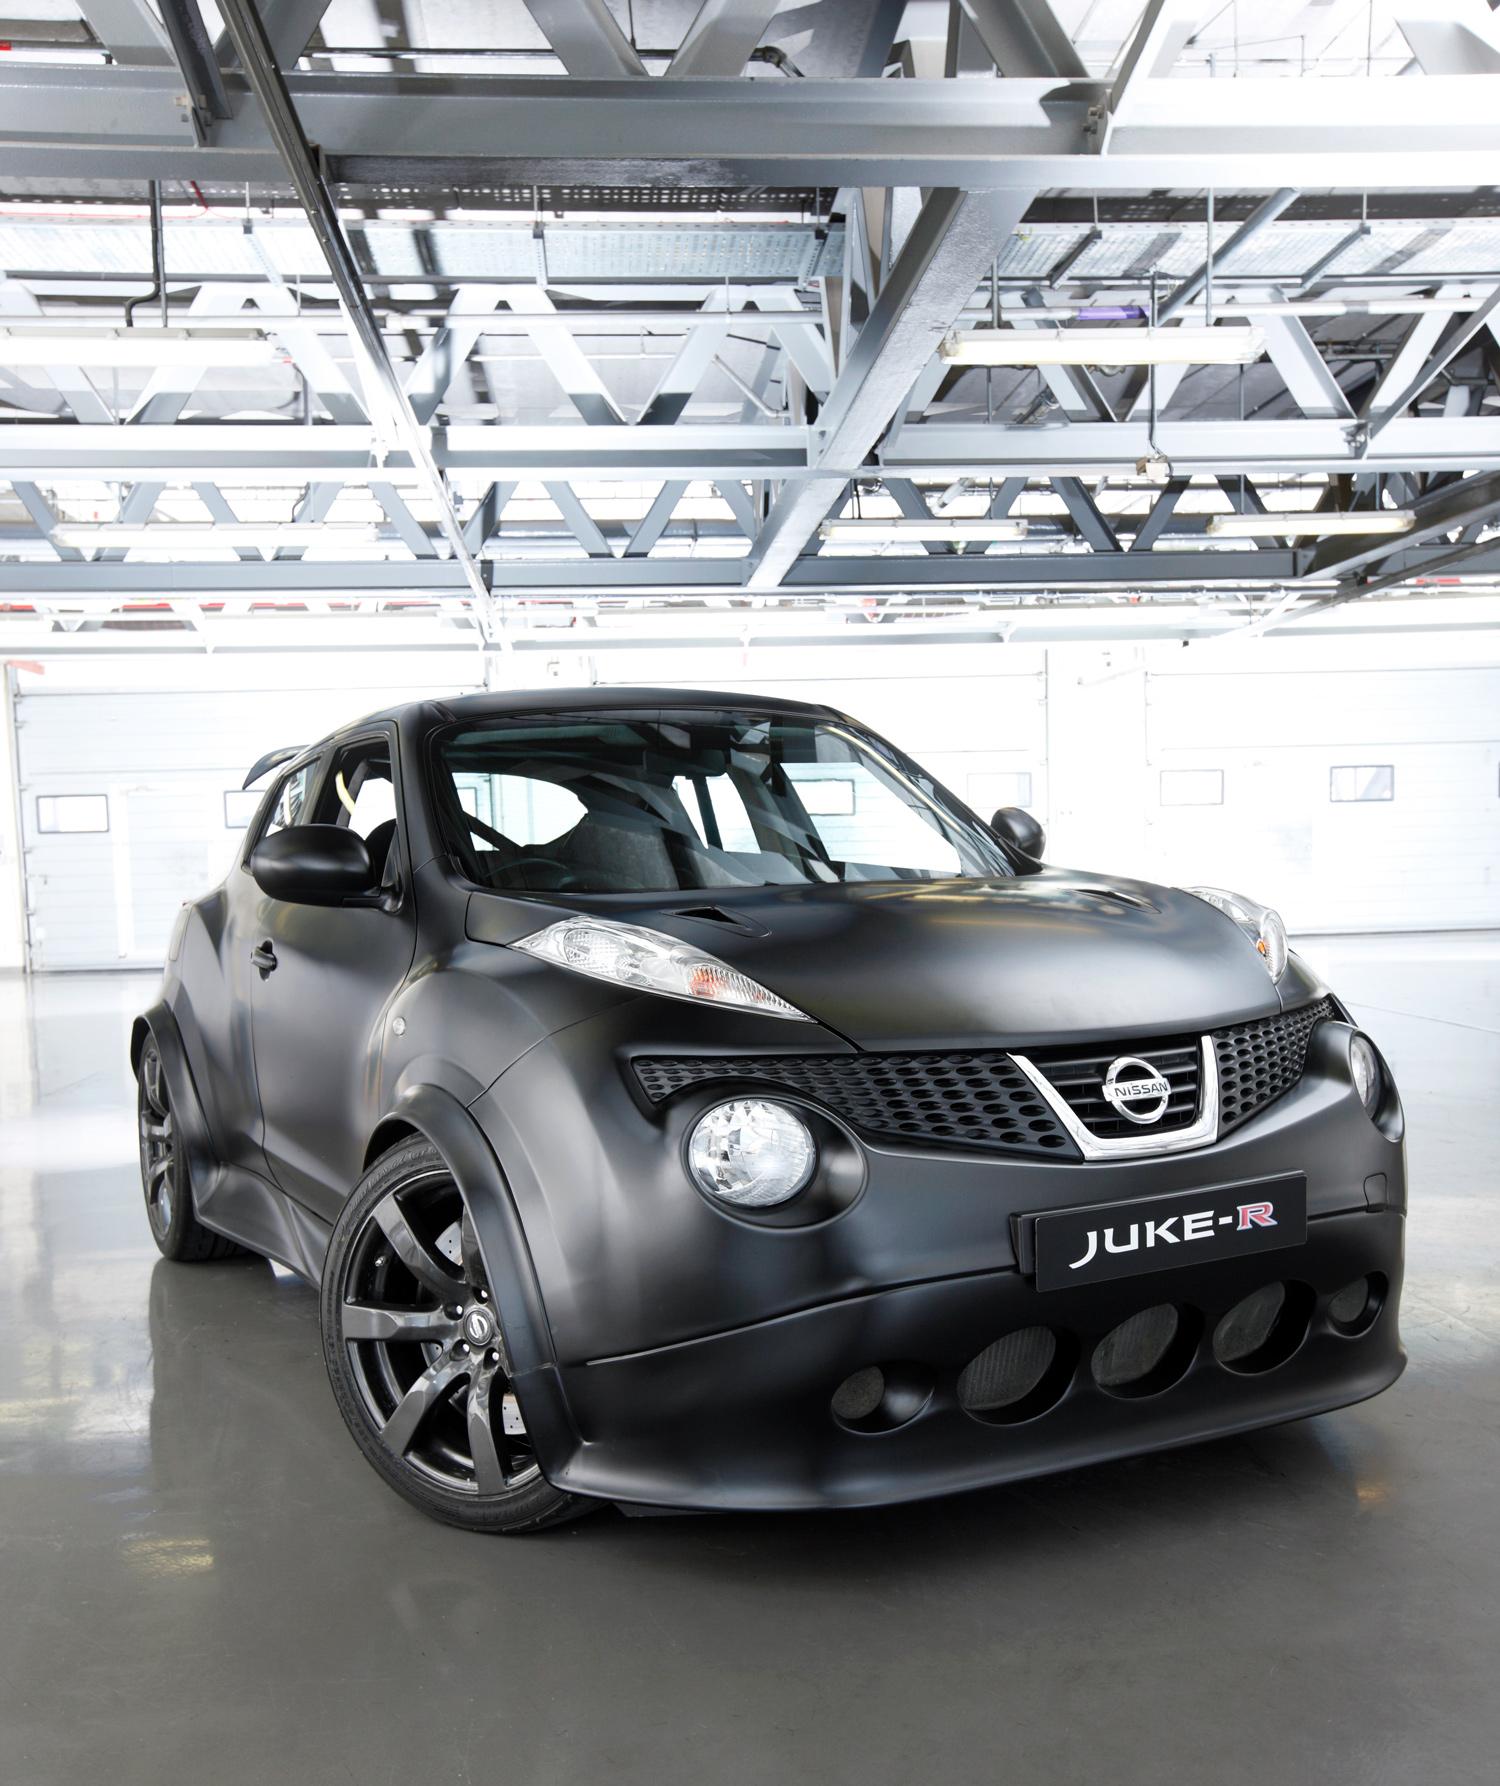 WH_120125_Nissan-Juke-R01.jpg